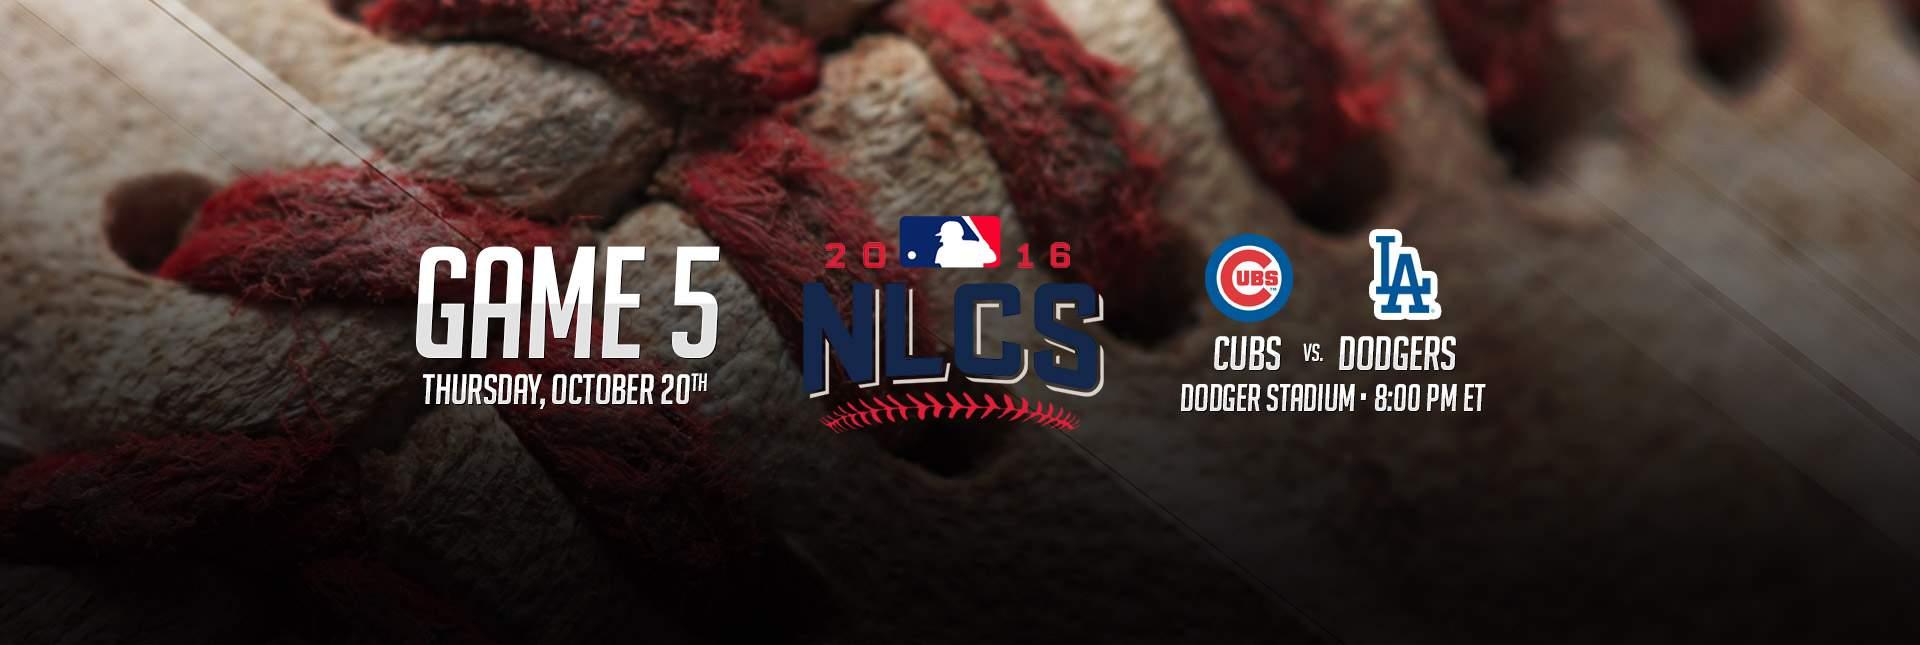 Cubs vs Dodgers Game 5